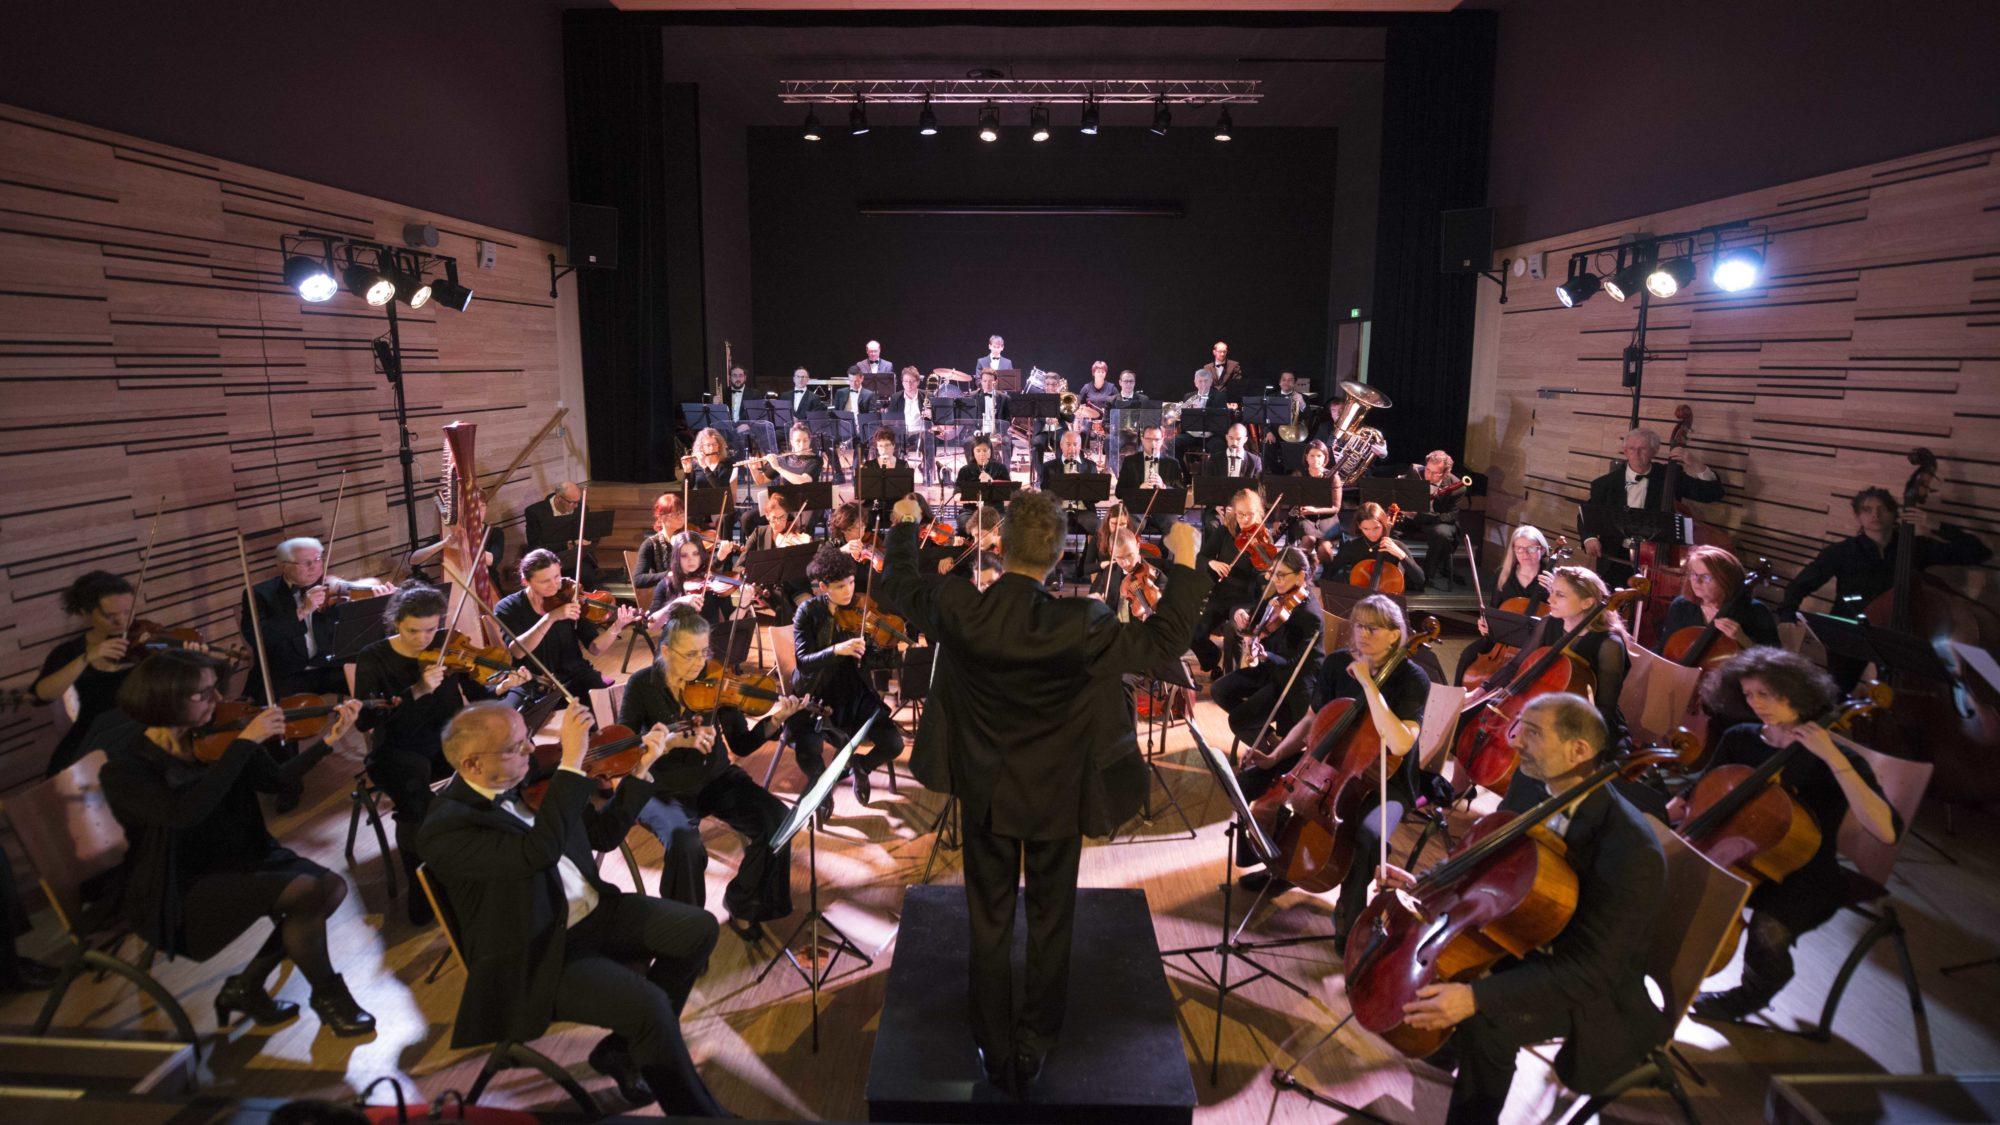 Ensemble Orchestral du Jura